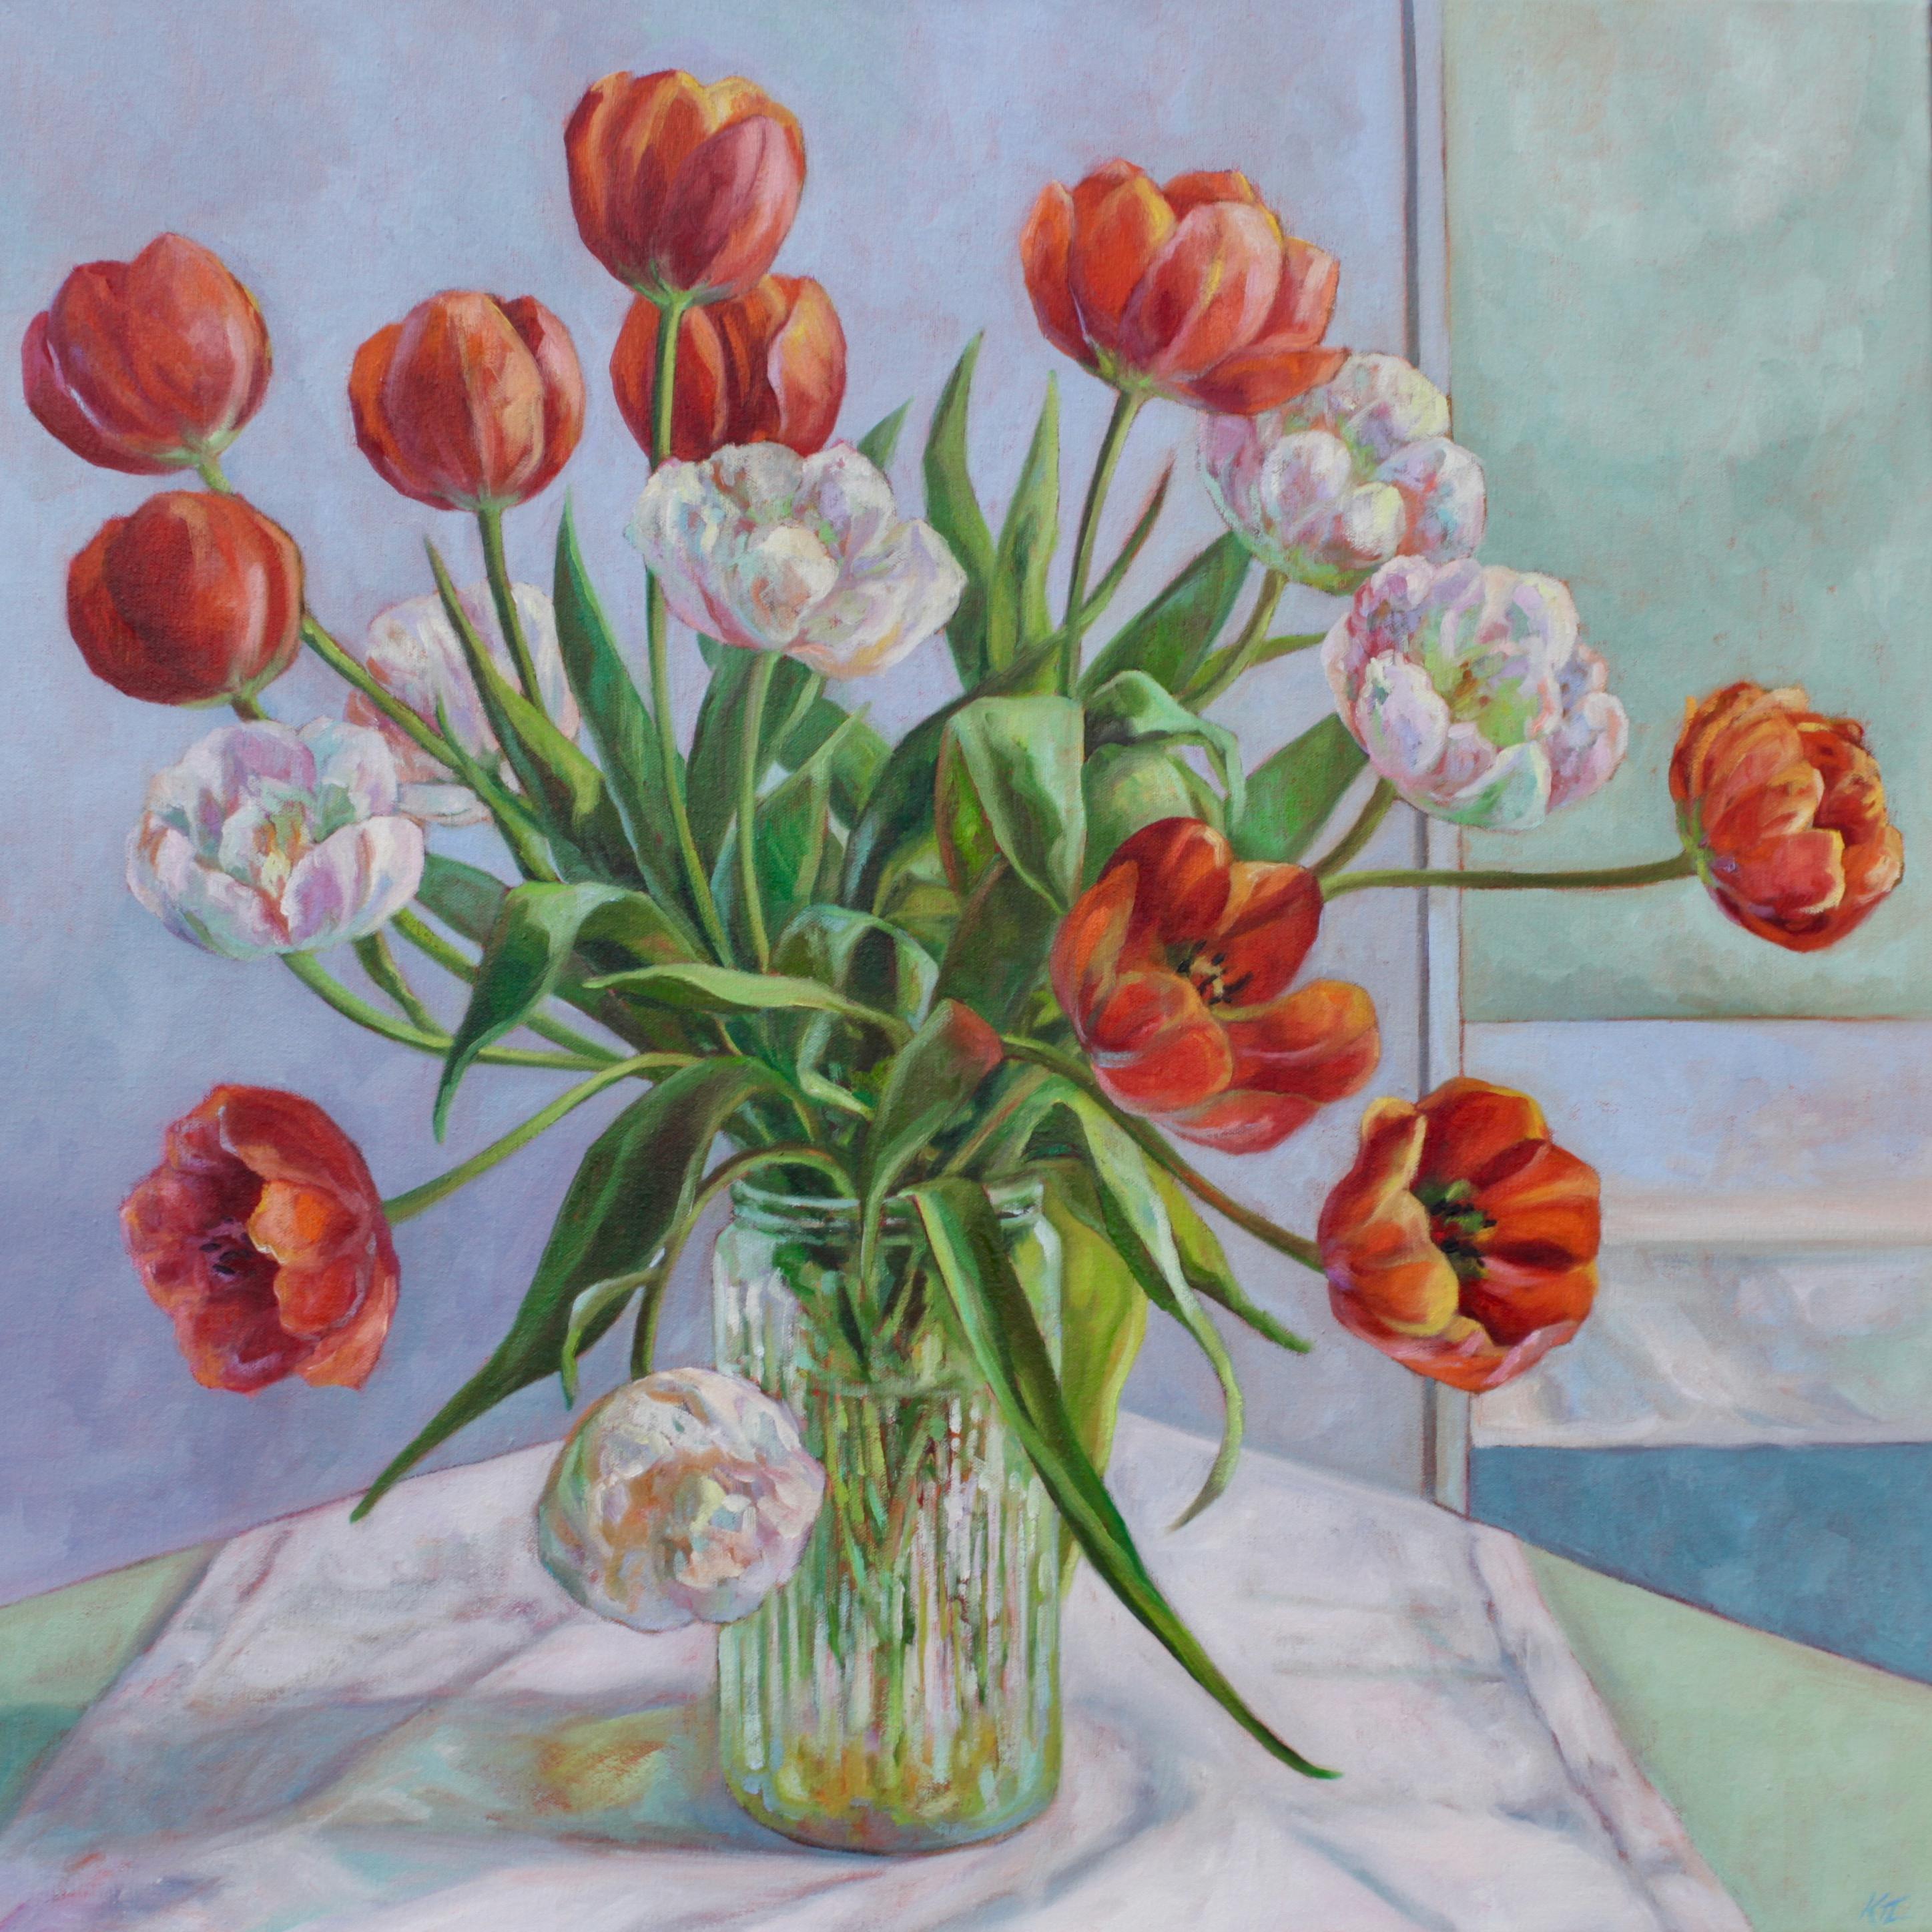 Ostend Tulips